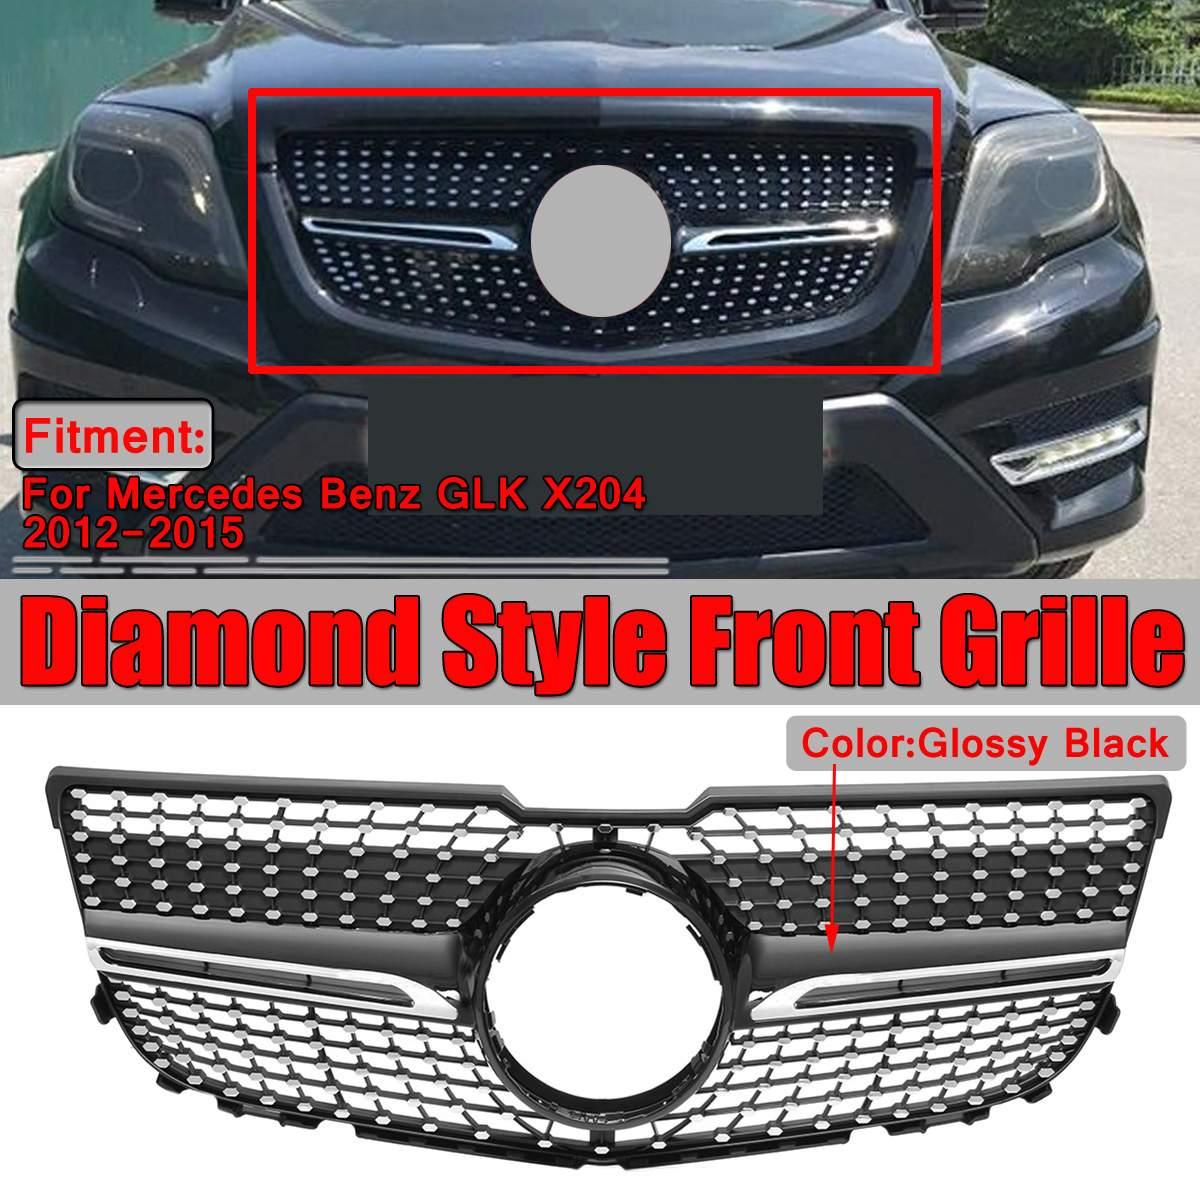 Chrome Front Grille Strip Kit trims For Mercedes-Benz X204 GLK300 250 2013-2015